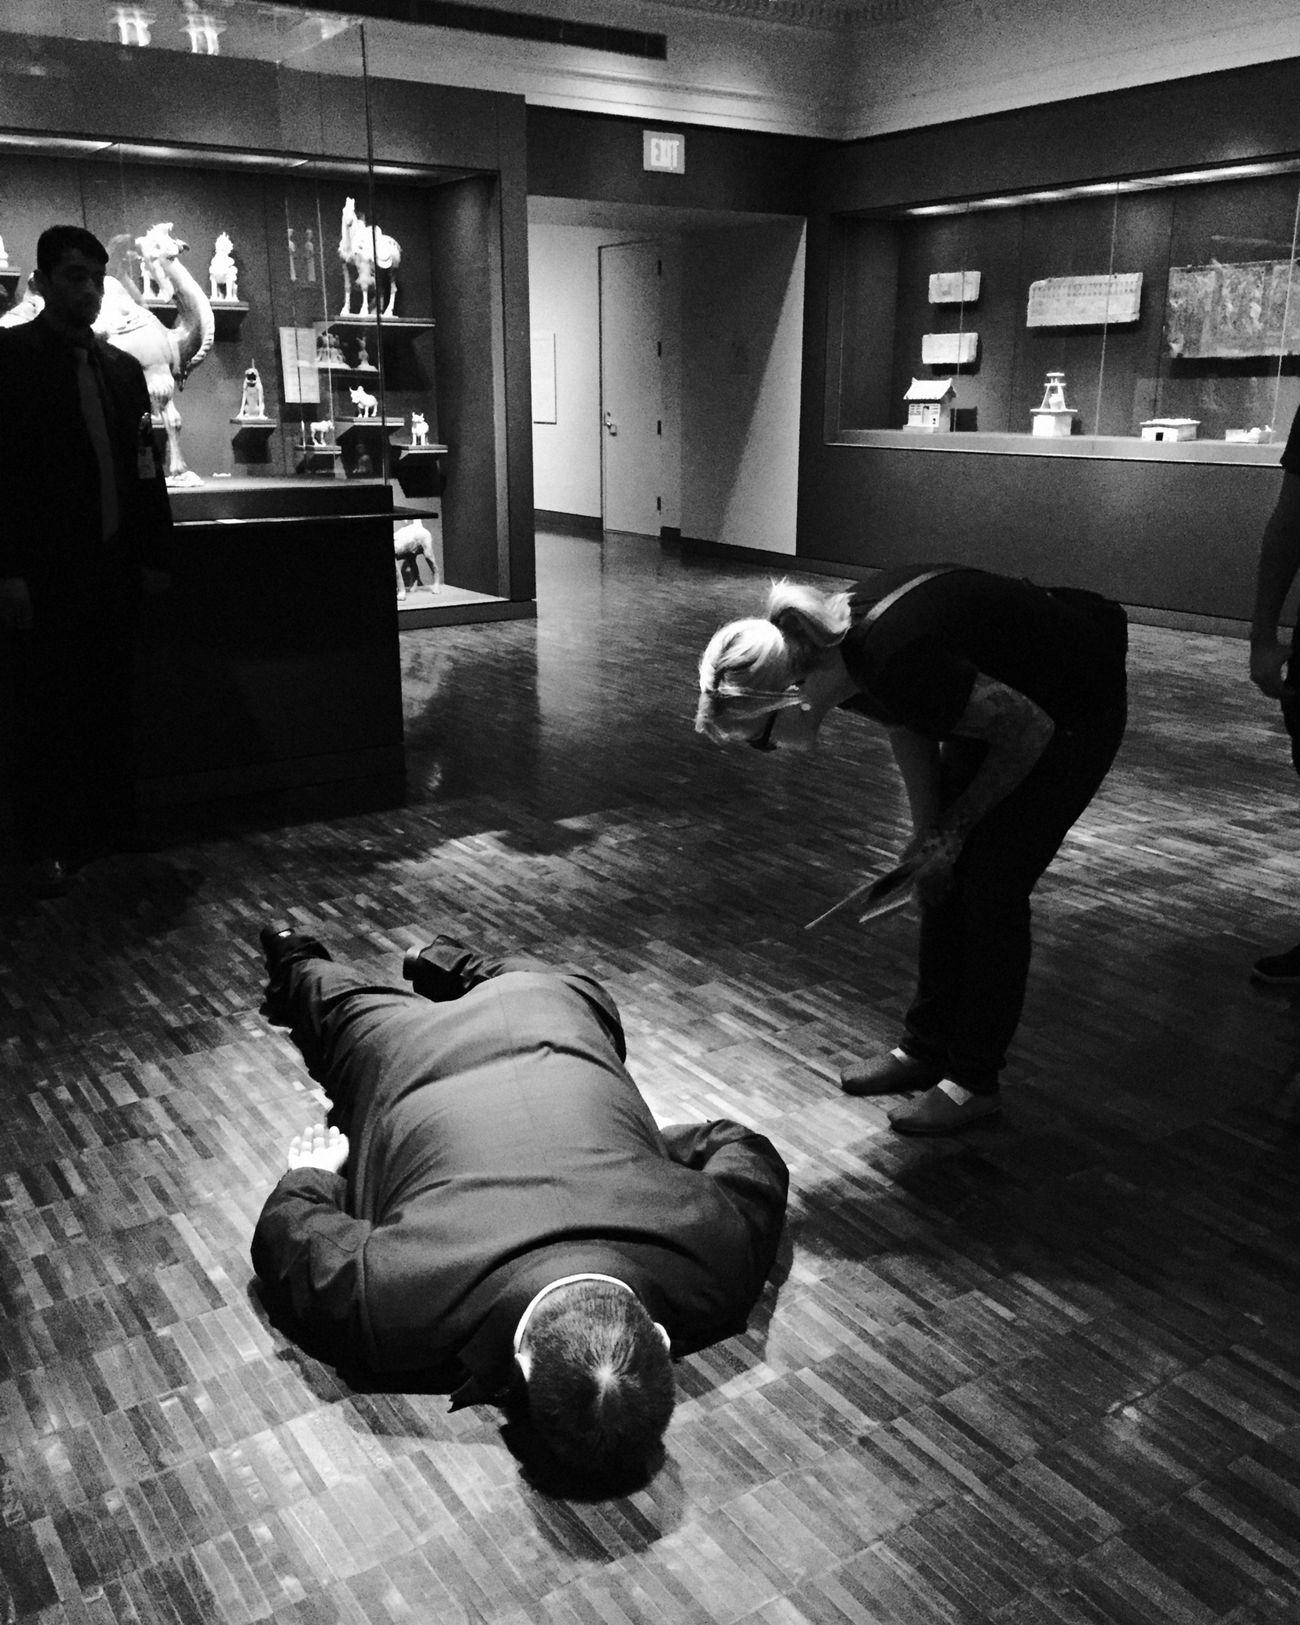 Aiweiwei Black & White Blackandwhite Photography San Francisco 28chinese Exhibition